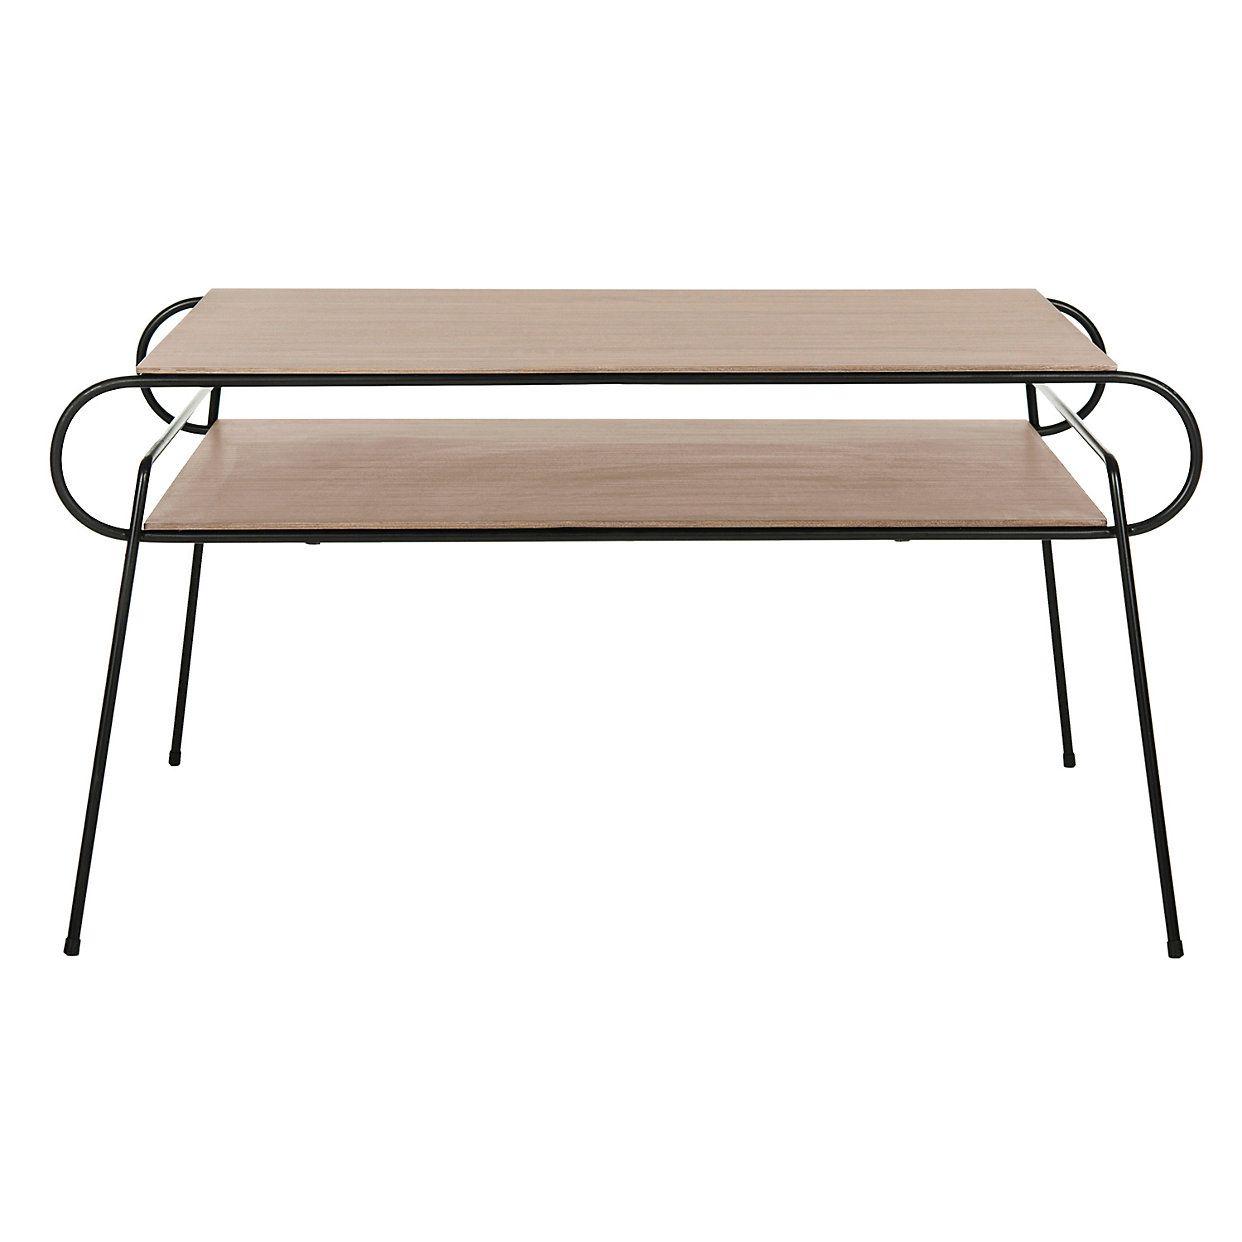 Safavieh Mid Century Modern 2 Tier Coffee Table Kohls Em 2020 Mesas De Centro Modernas Mesa [ 1242 x 1242 Pixel ]